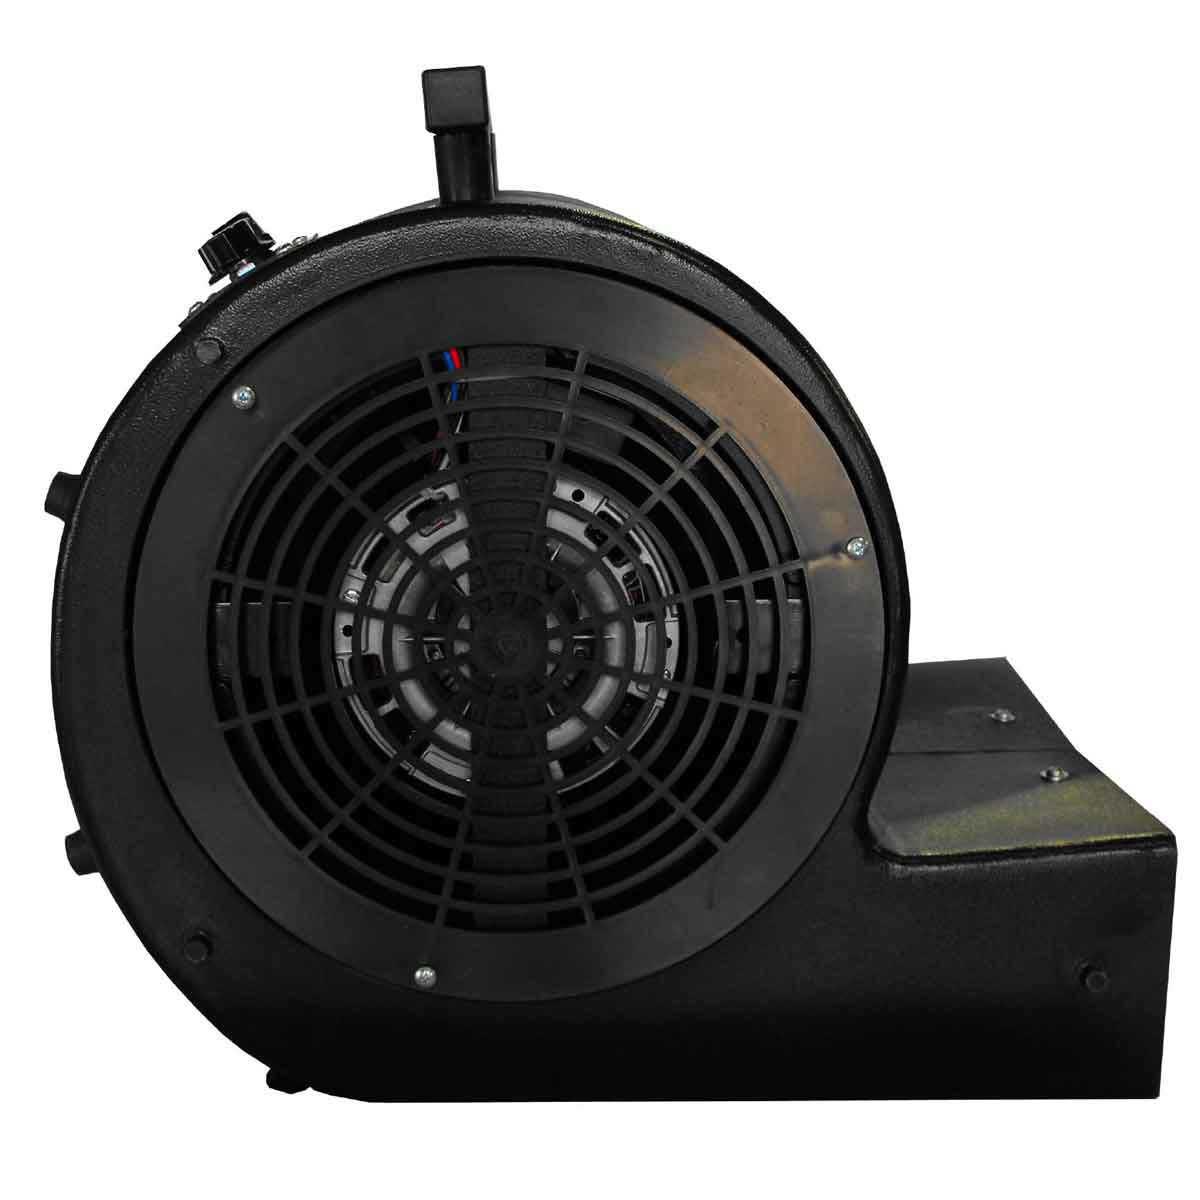 BH001-BLACK Hawk Industrial Black Air Blower